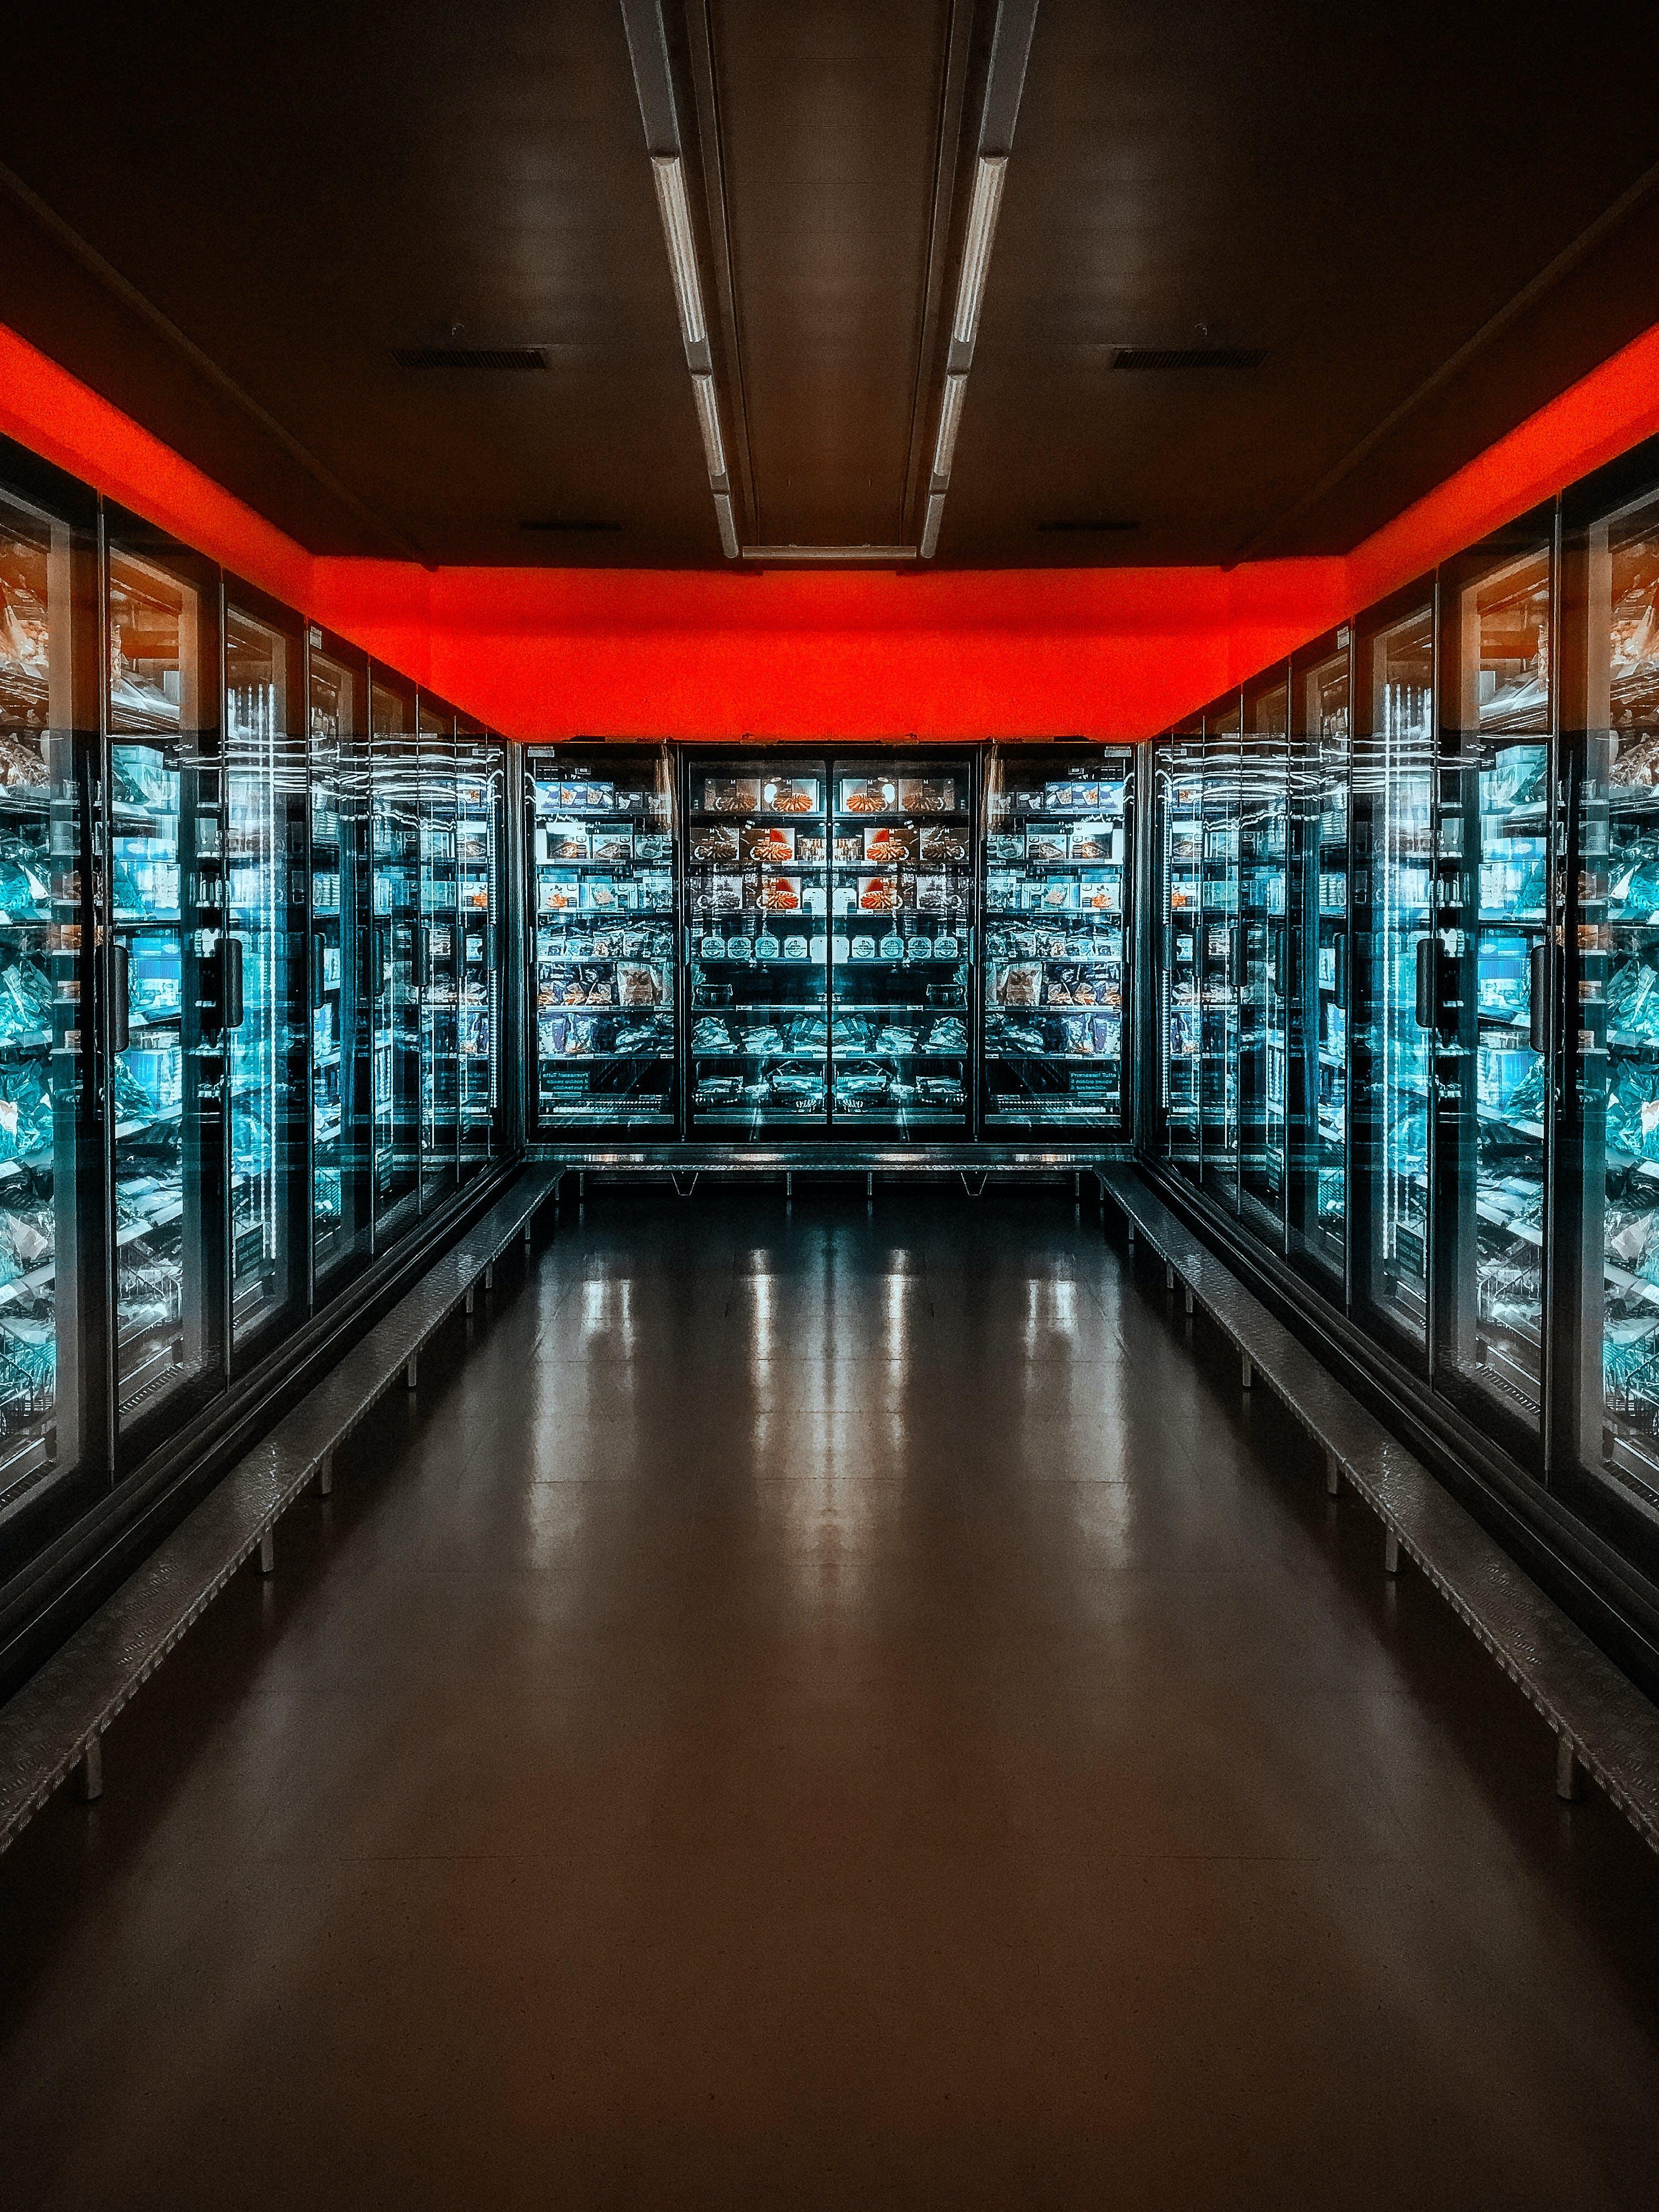 Black Commercial Refrigerator